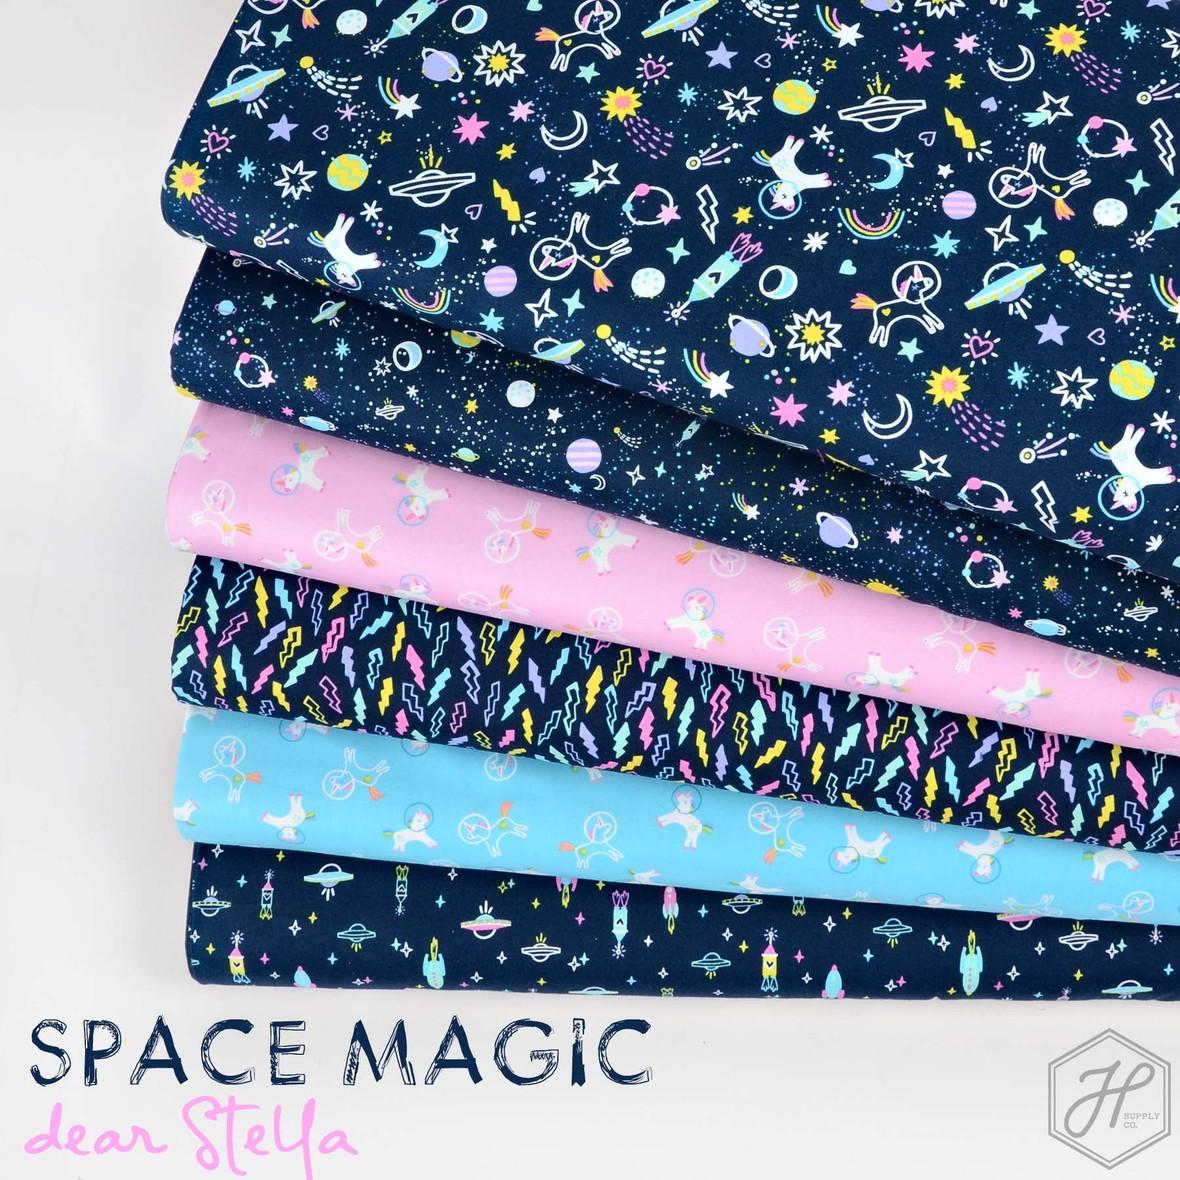 Space Magic Fabric Dear Stella at Hawthorne Supply Co